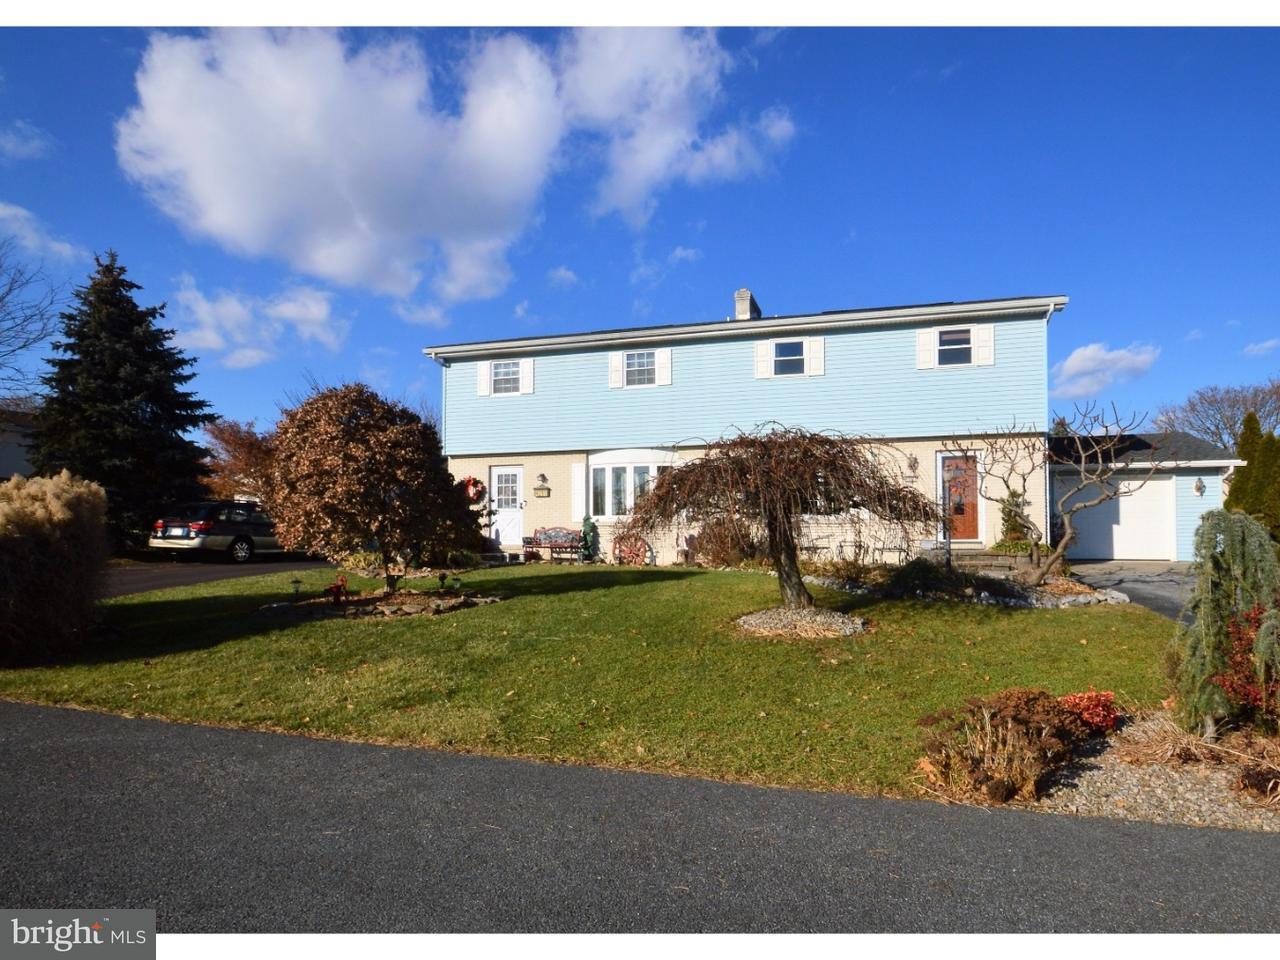 Townhouse for Sale at 4257 IROQUOIS Street Schnecksville, Pennsylvania 18078 United States